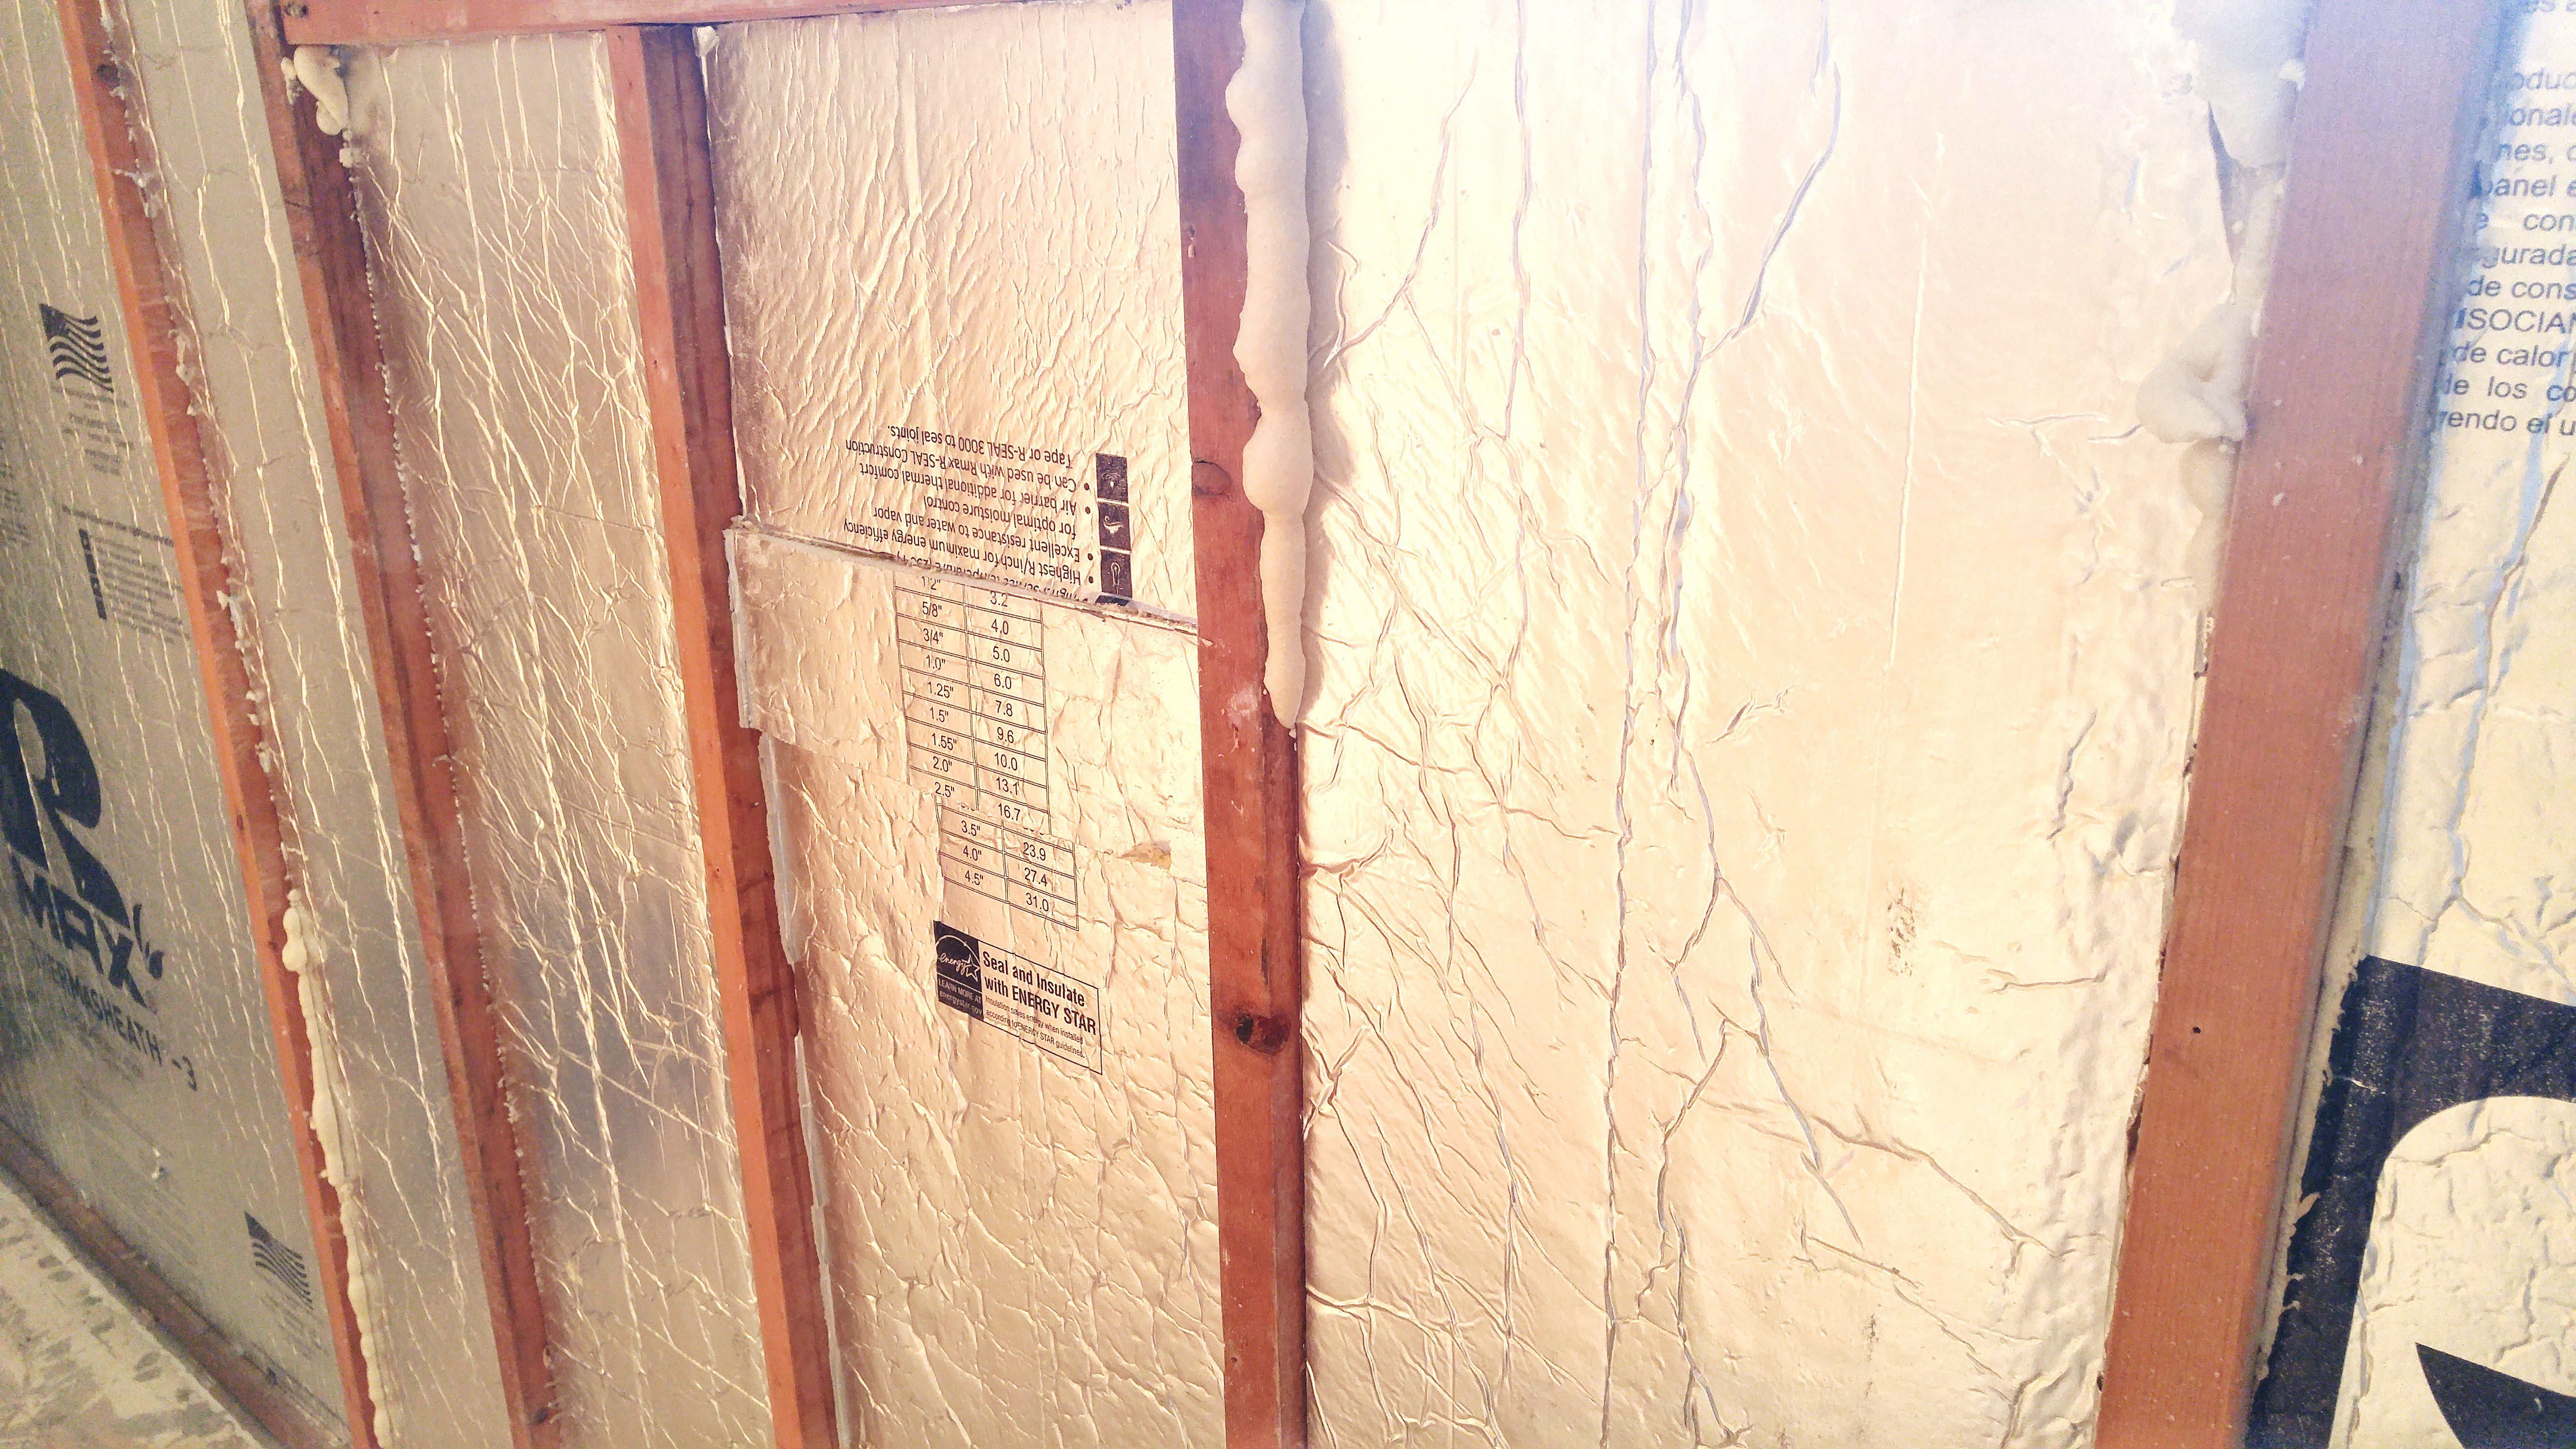 Installing Foam Board Insulation Between Studs